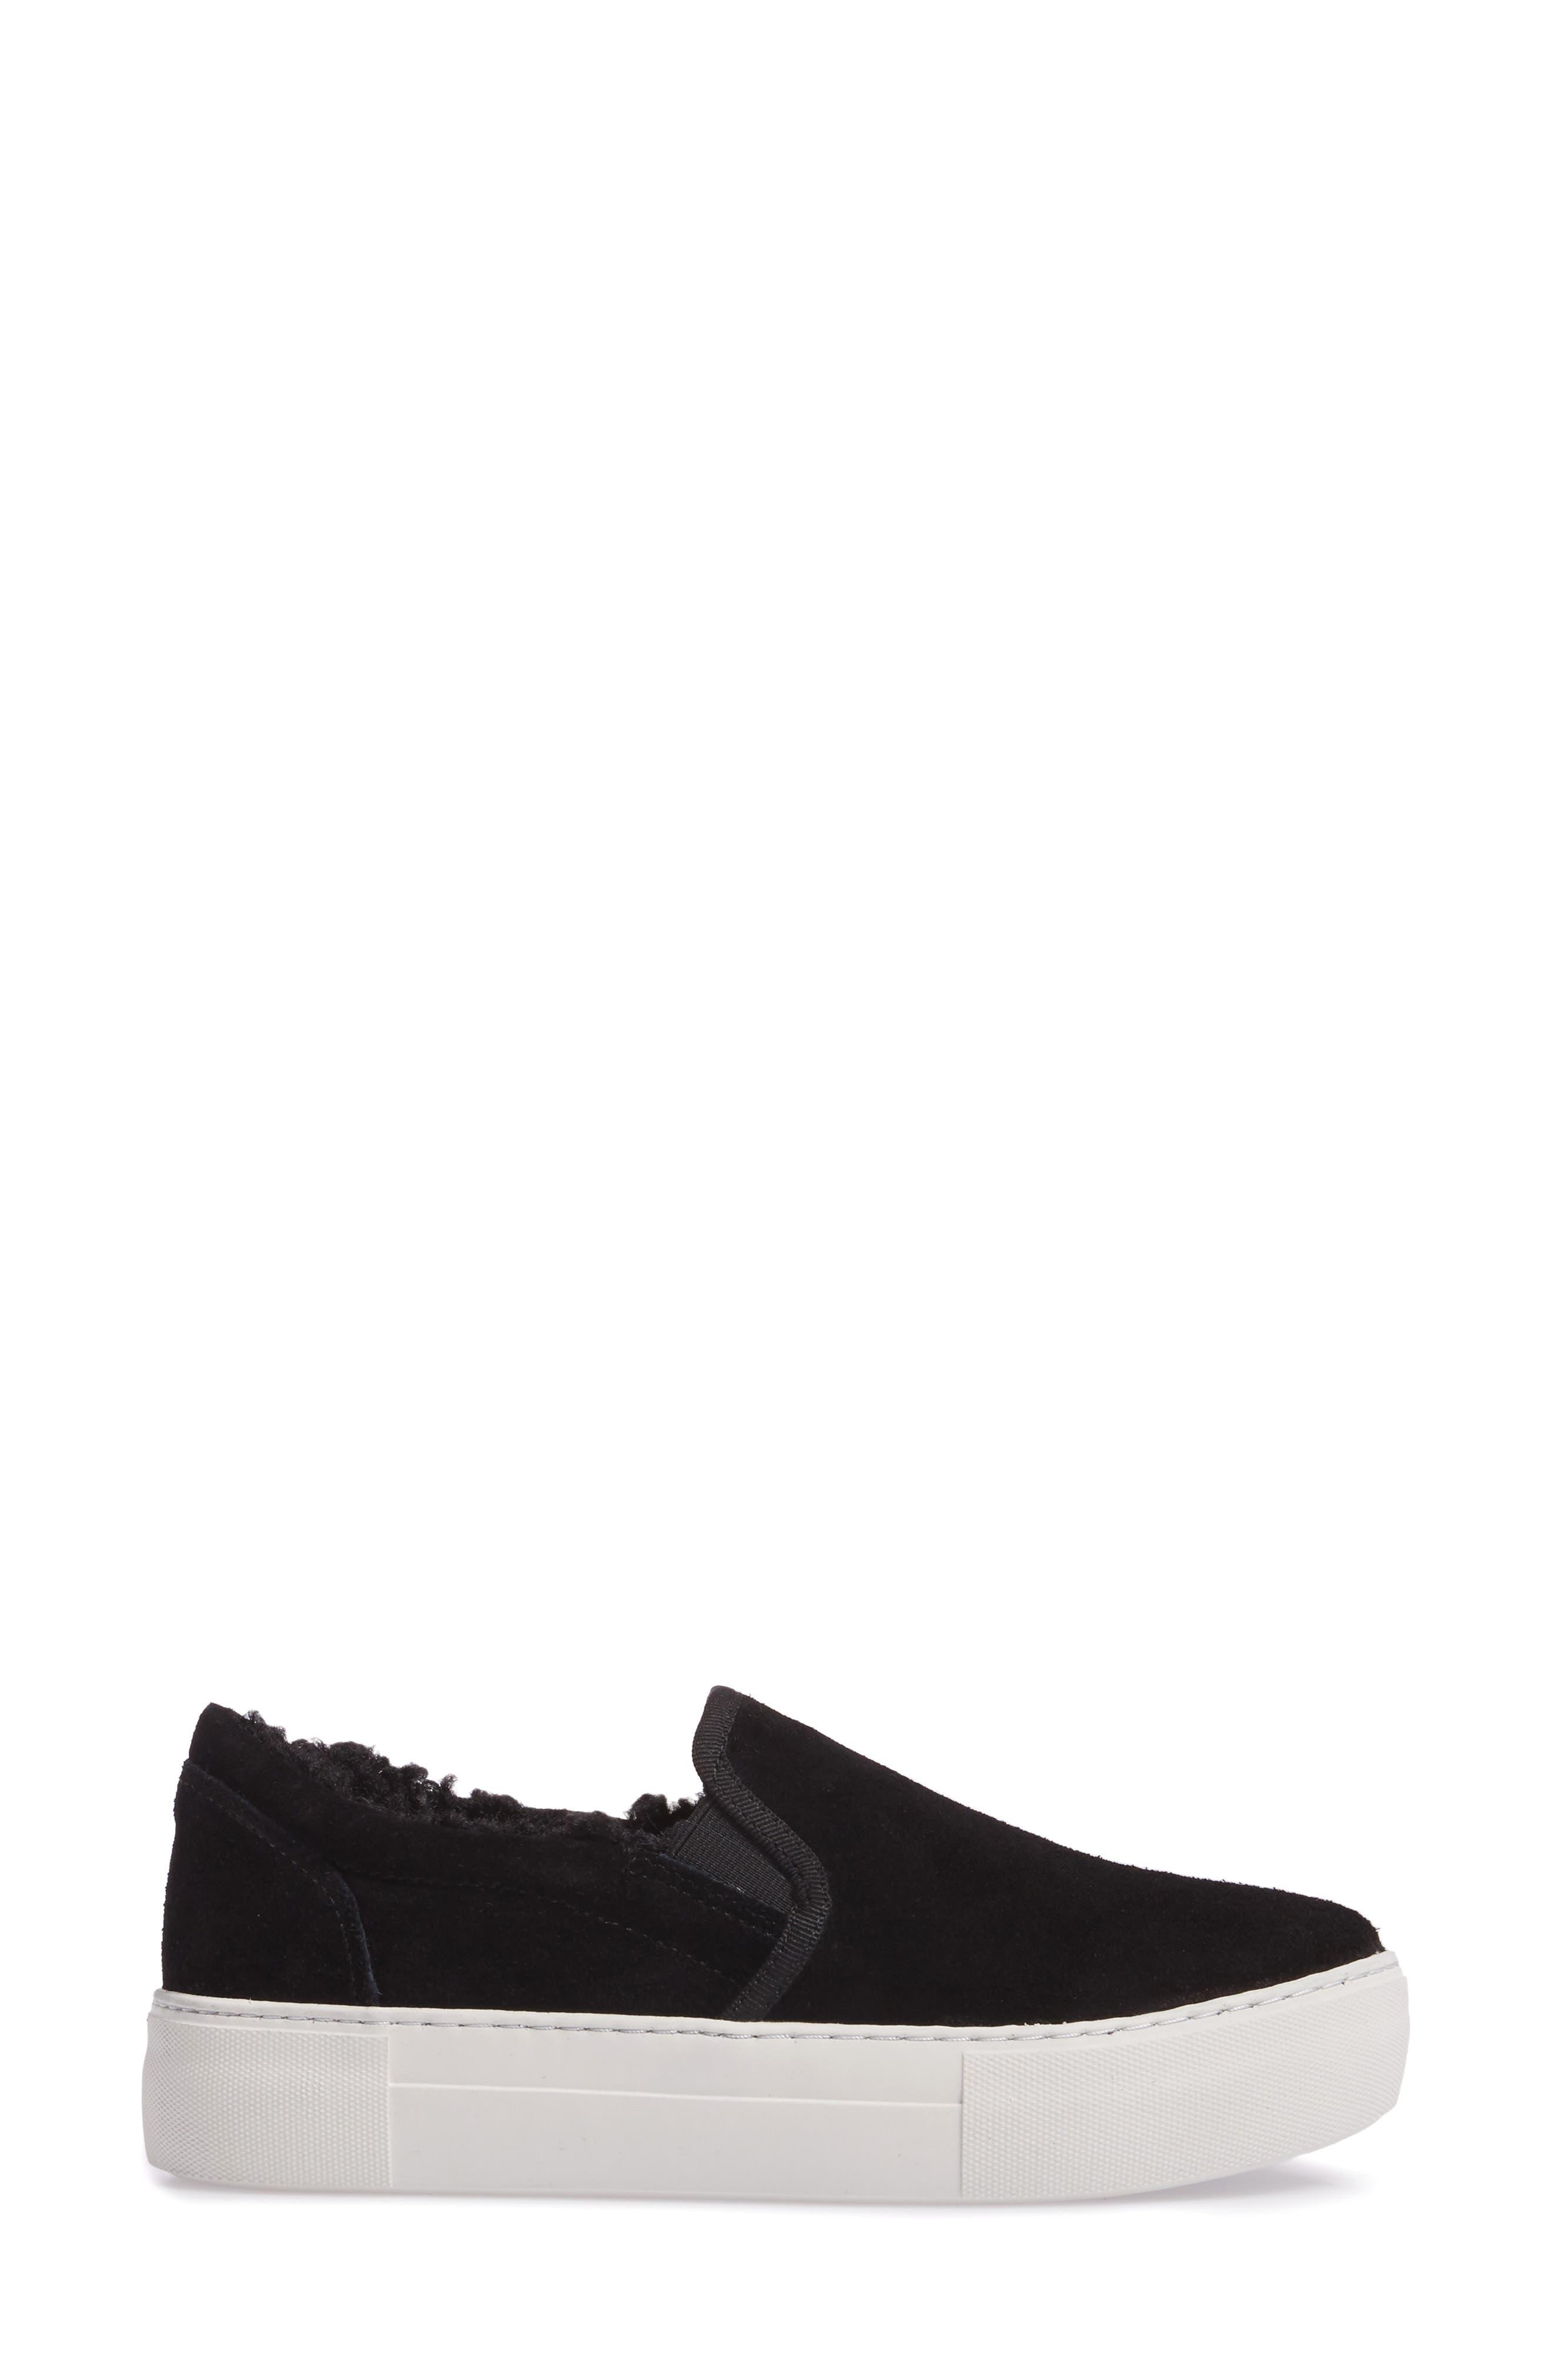 Arpel Faux Fur Lined Slip-On Sneaker,                             Alternate thumbnail 3, color,                             Black Suede